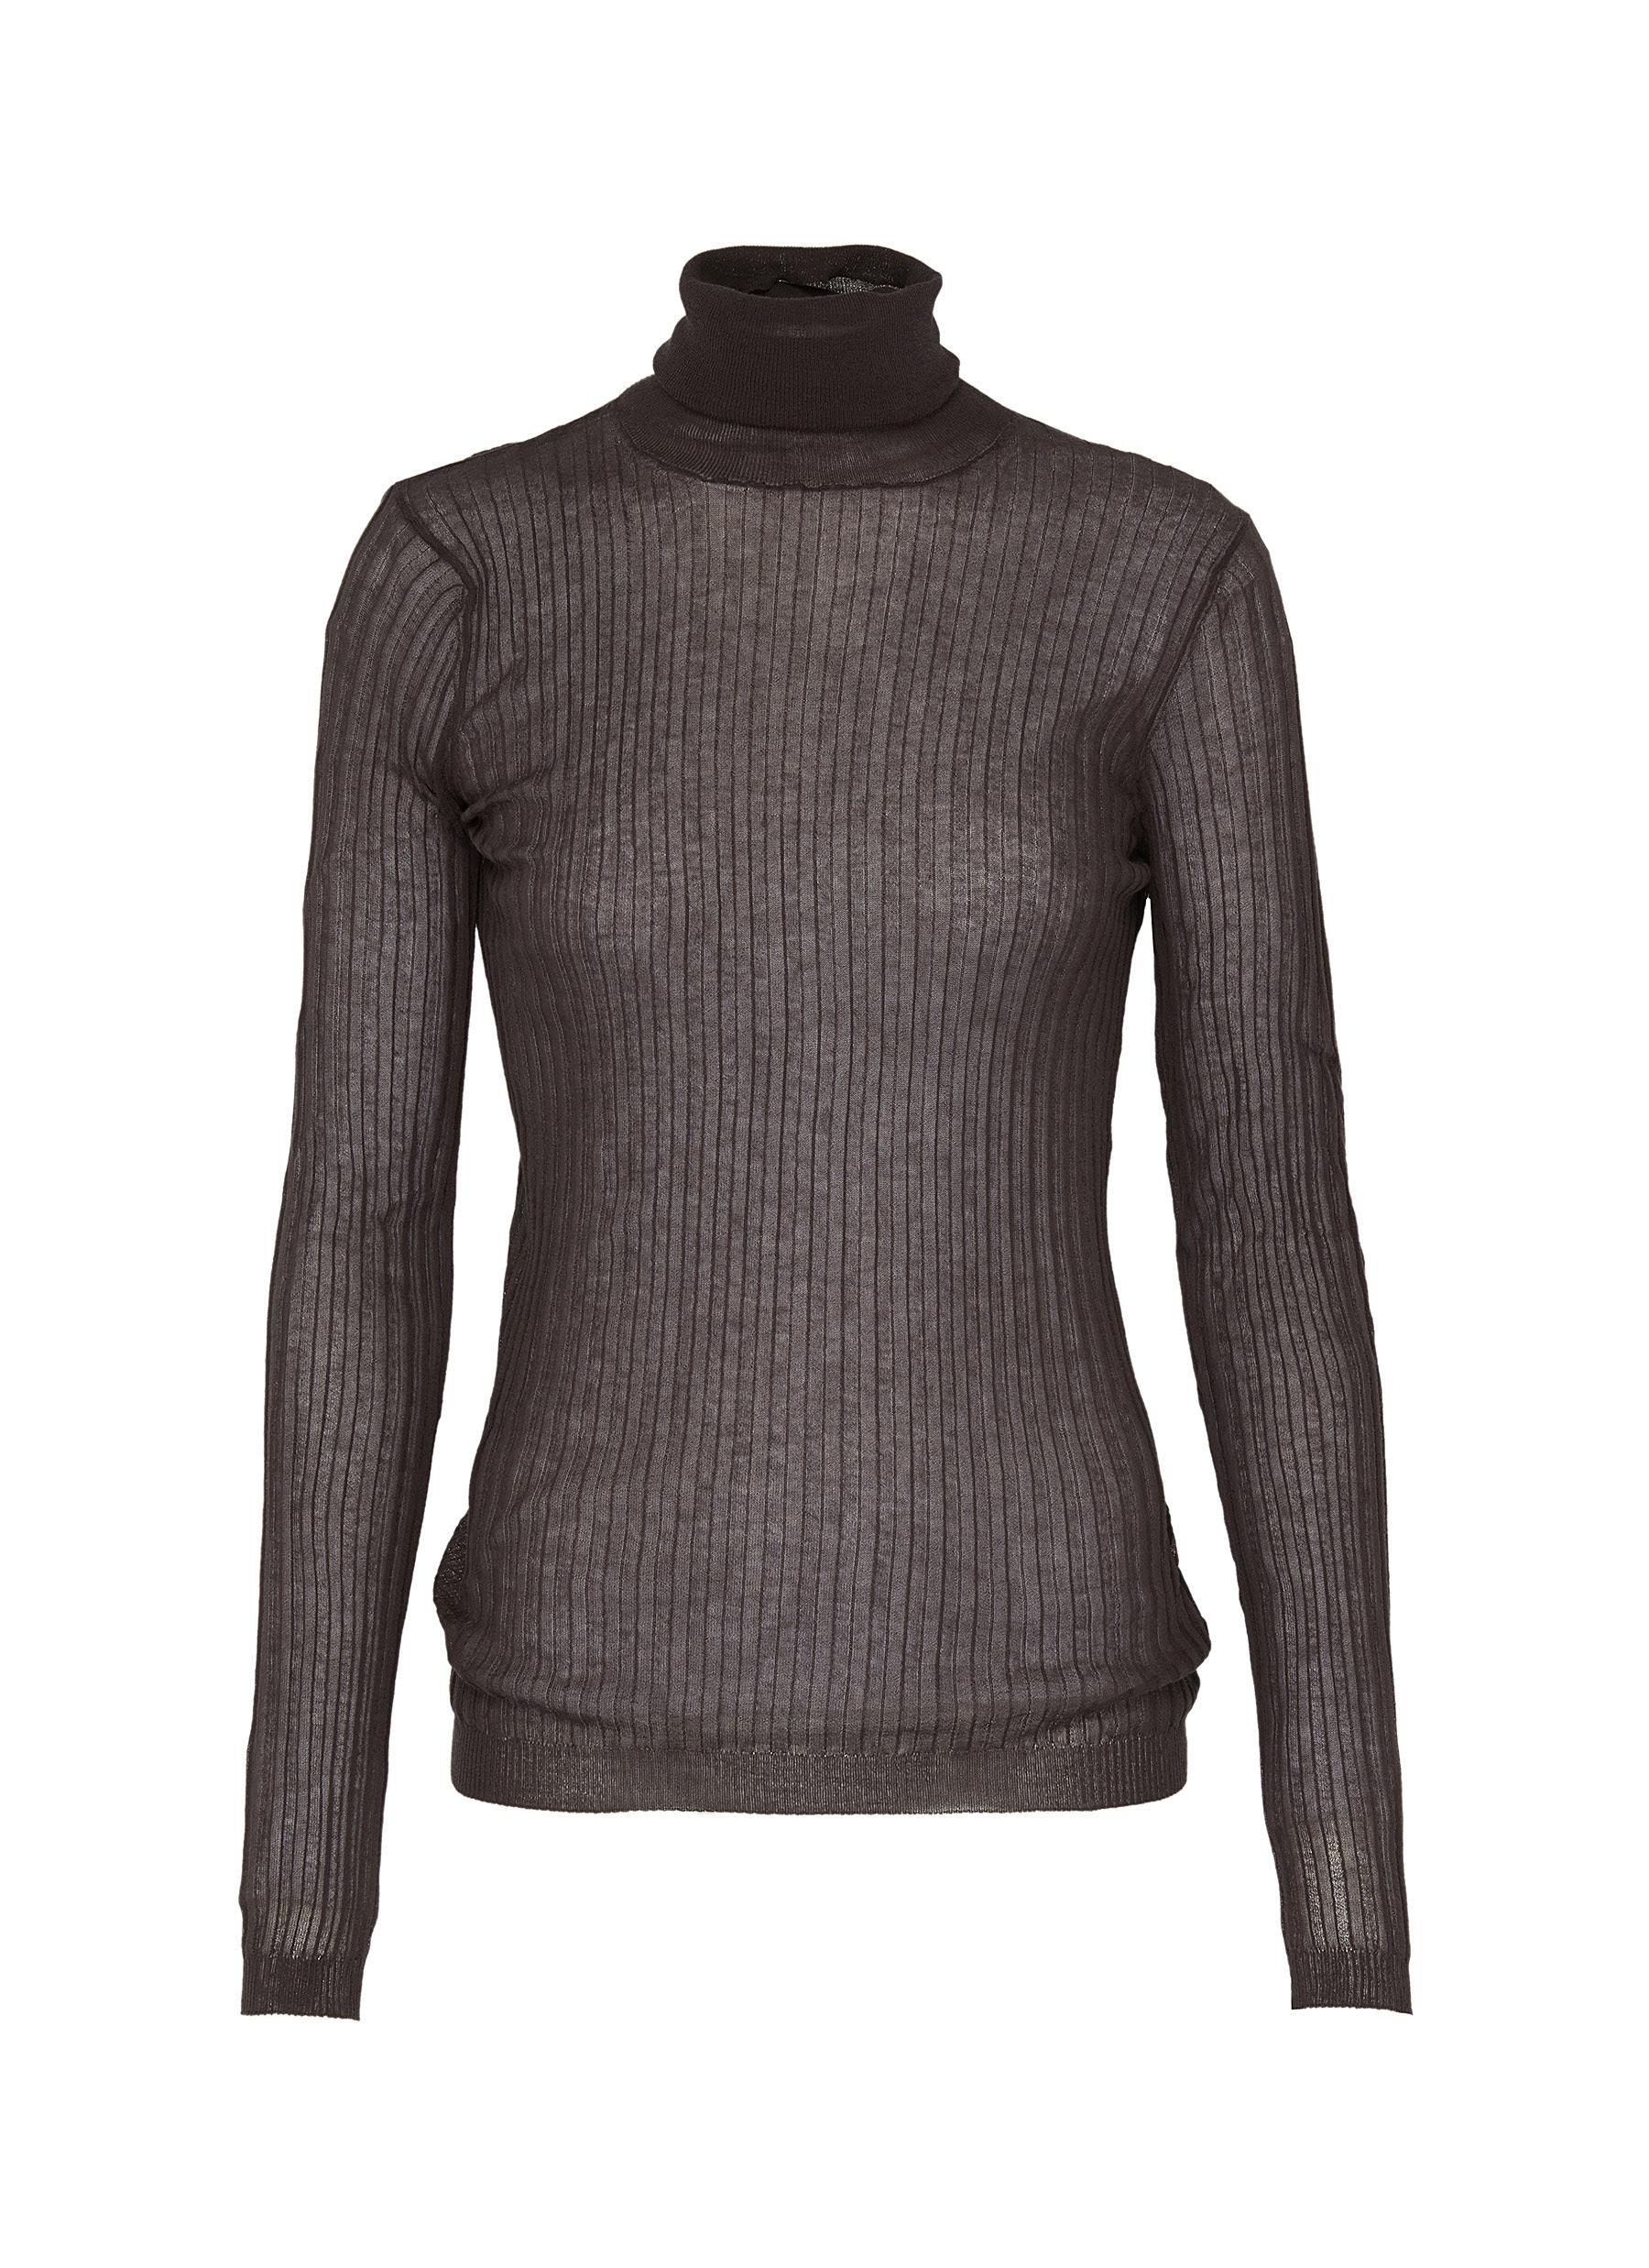 Sheer rib knit turtleneck sweater by Bottega Veneta